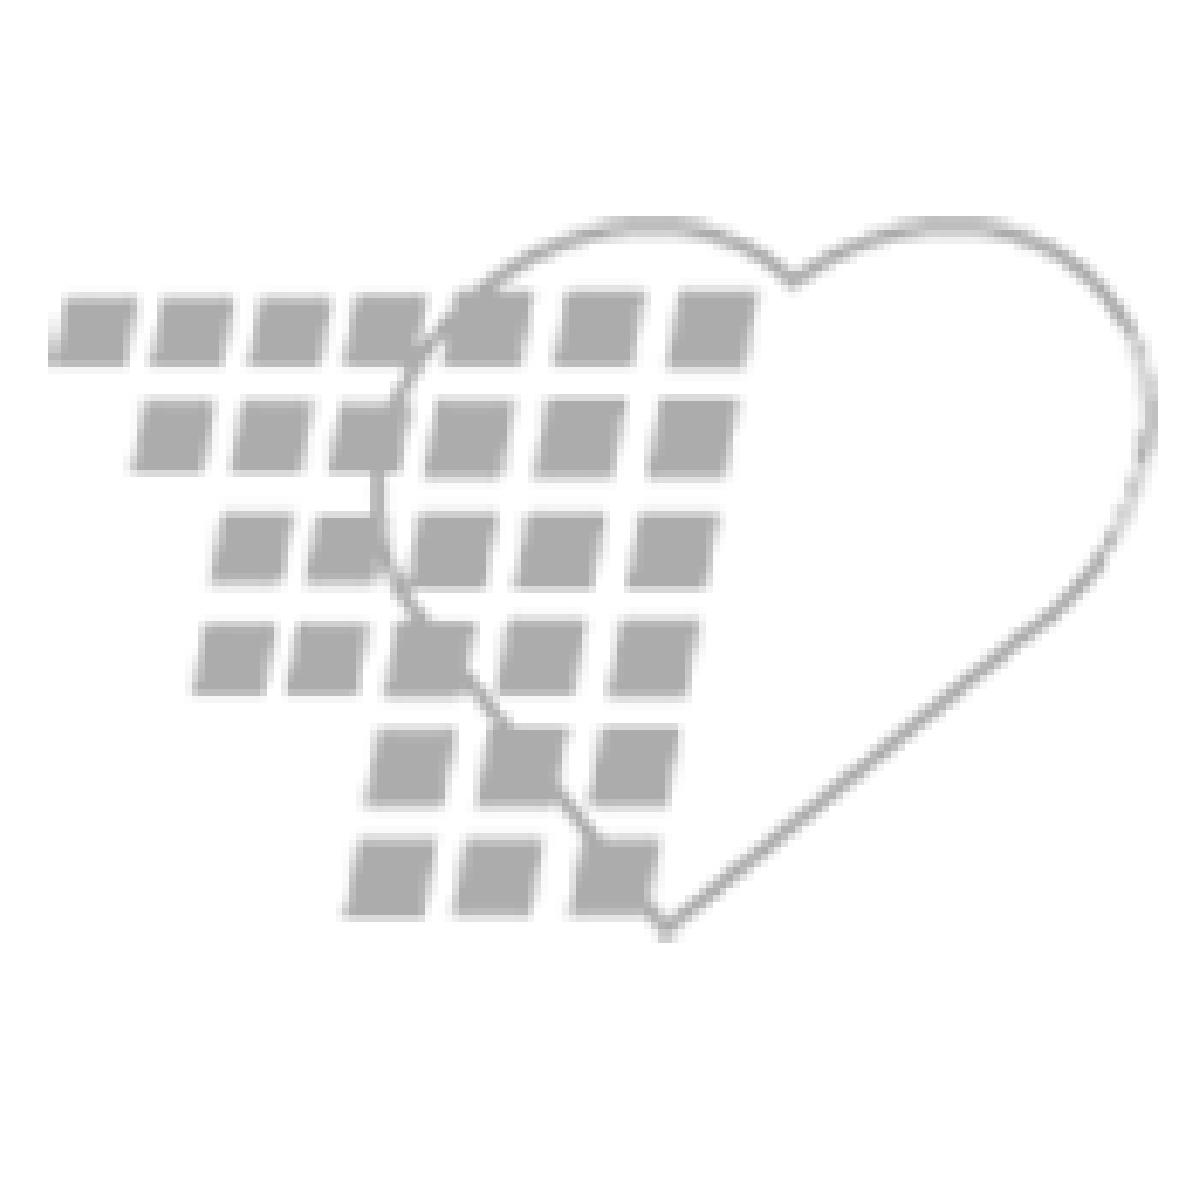 02-70-5243 Welch Allyn Kleenspec Specula